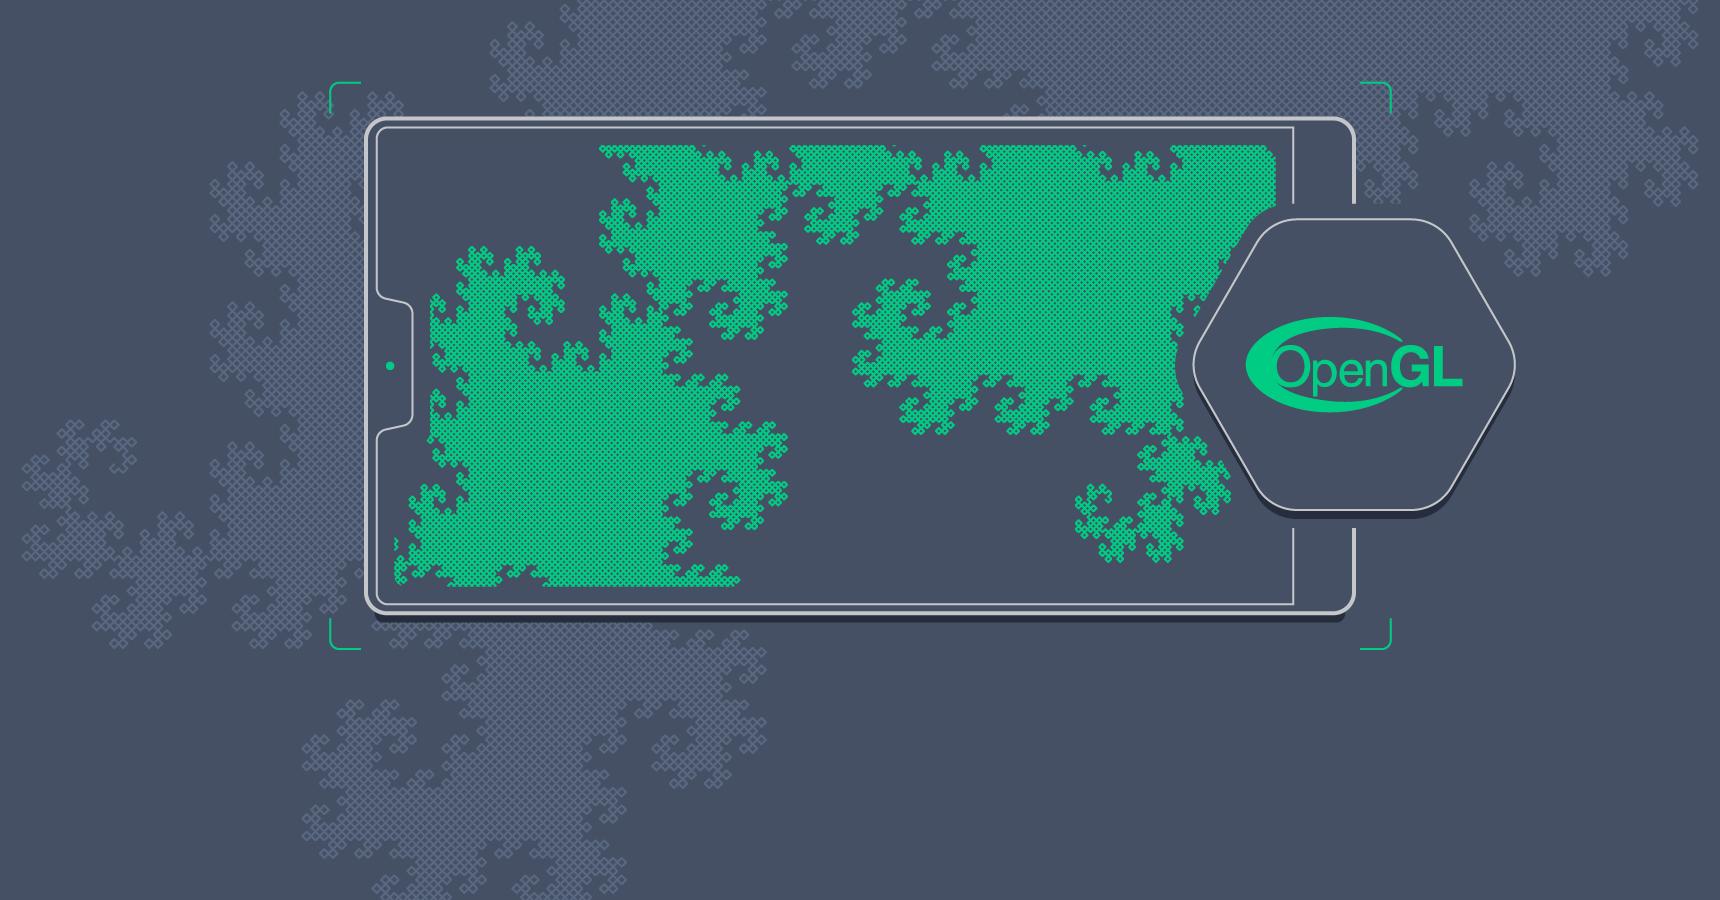 OpenGL and Mandelbrot set generator